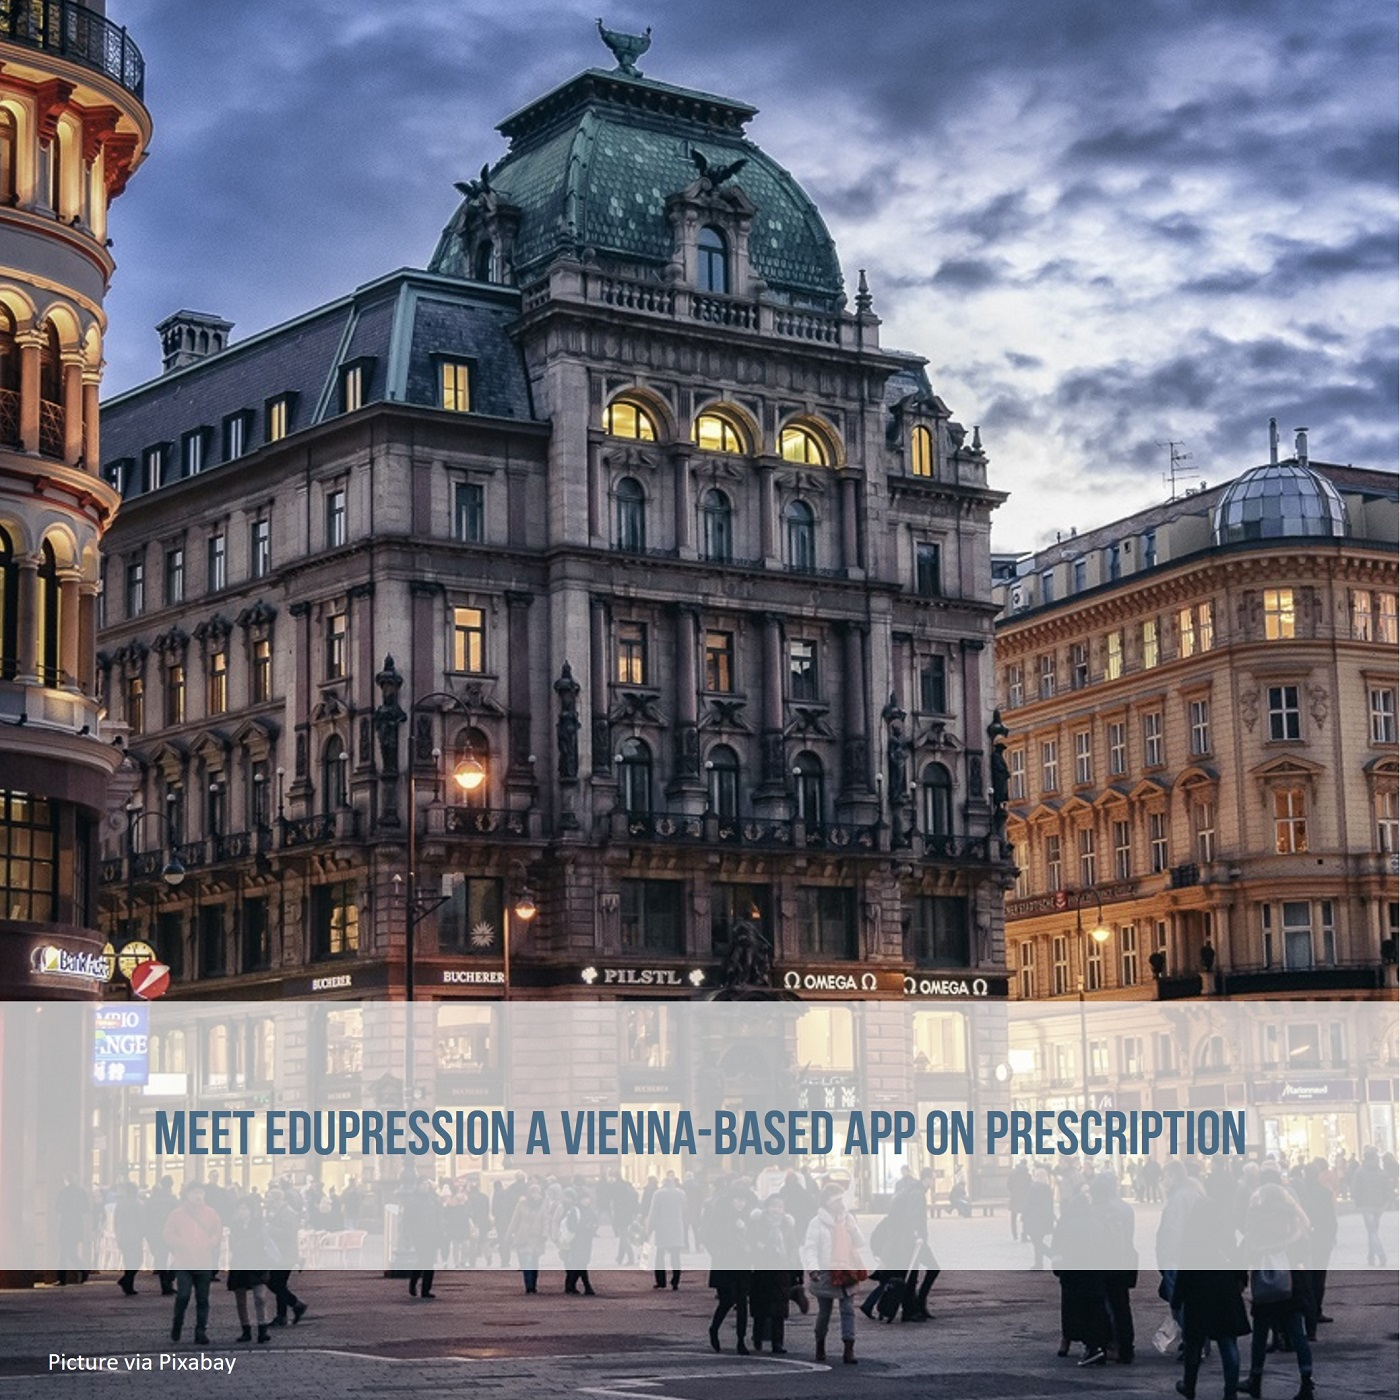 Meet Edupression a Vienna-Based App on Prescription